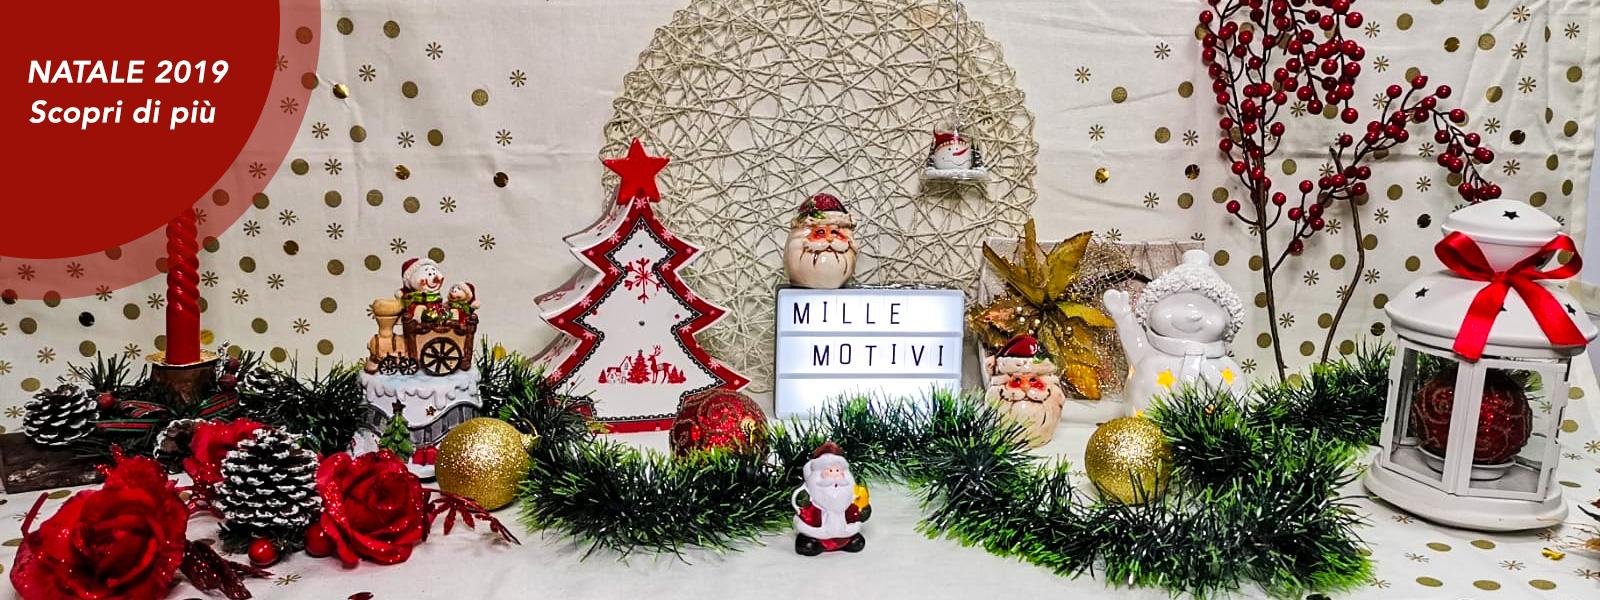 Slide Natale 2019